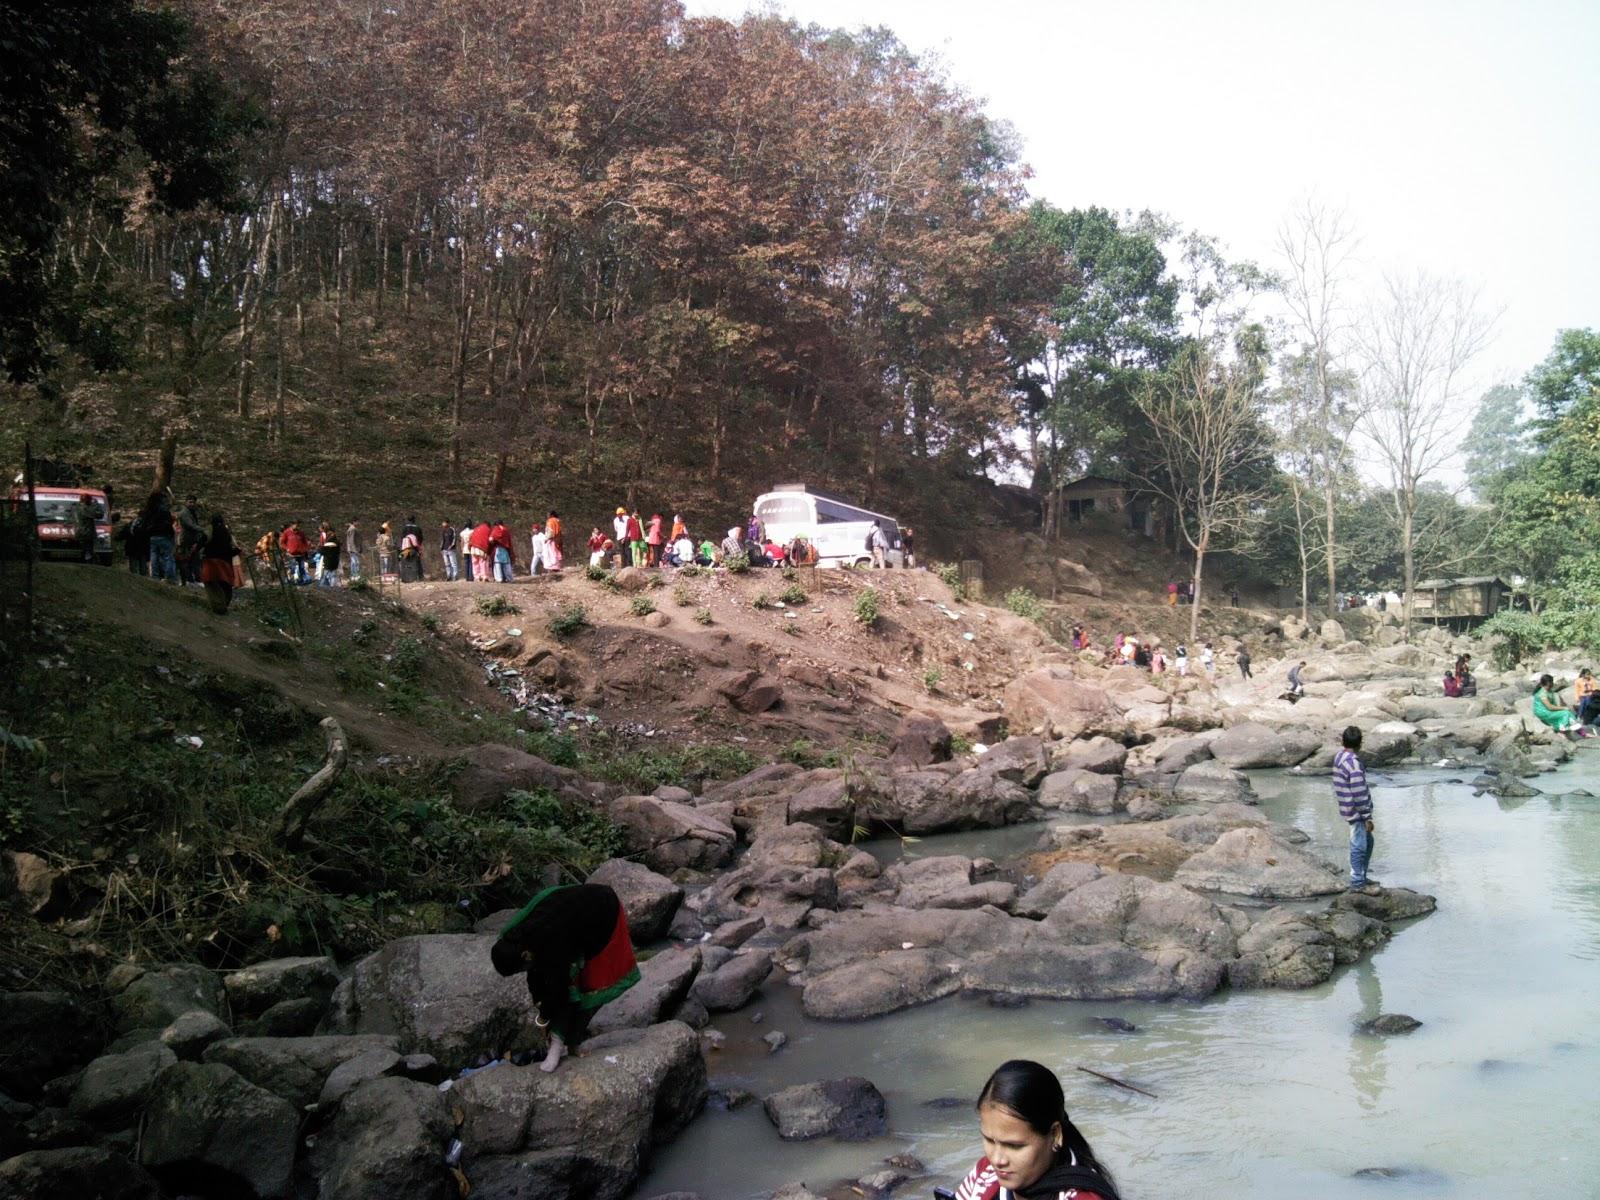 Picnic Place Picnic Place of Kaziranga